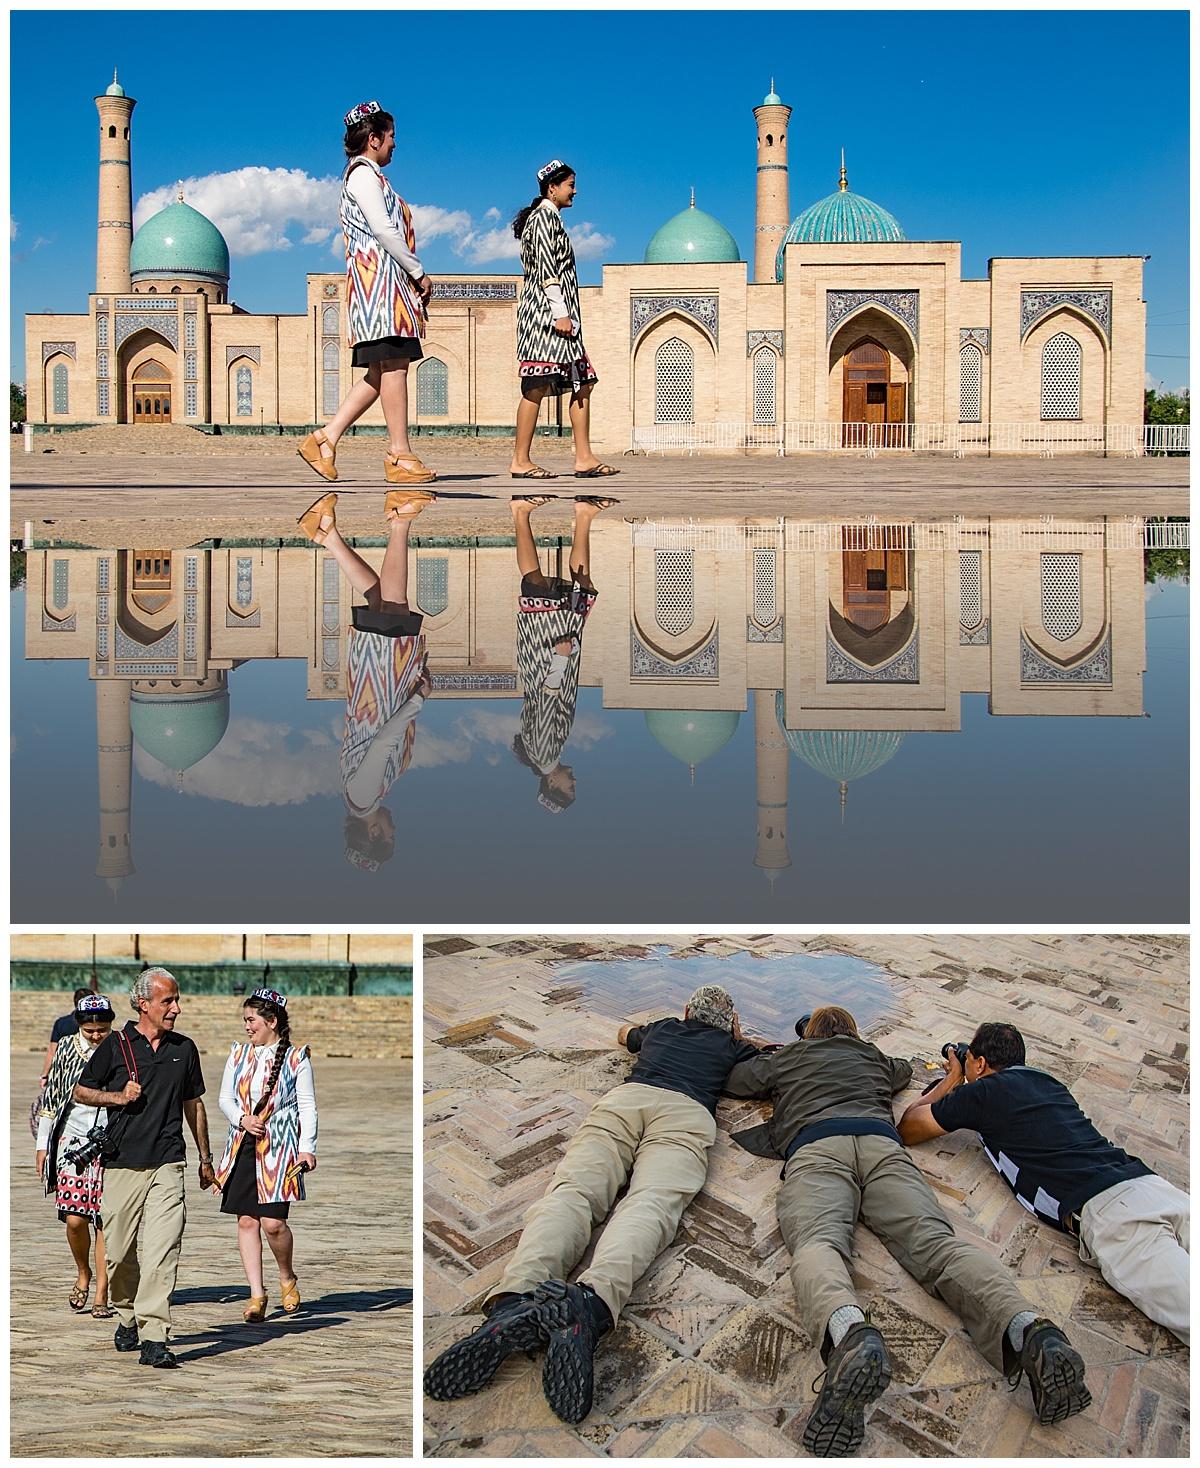 Tashkent, Uzbekistan - reflection